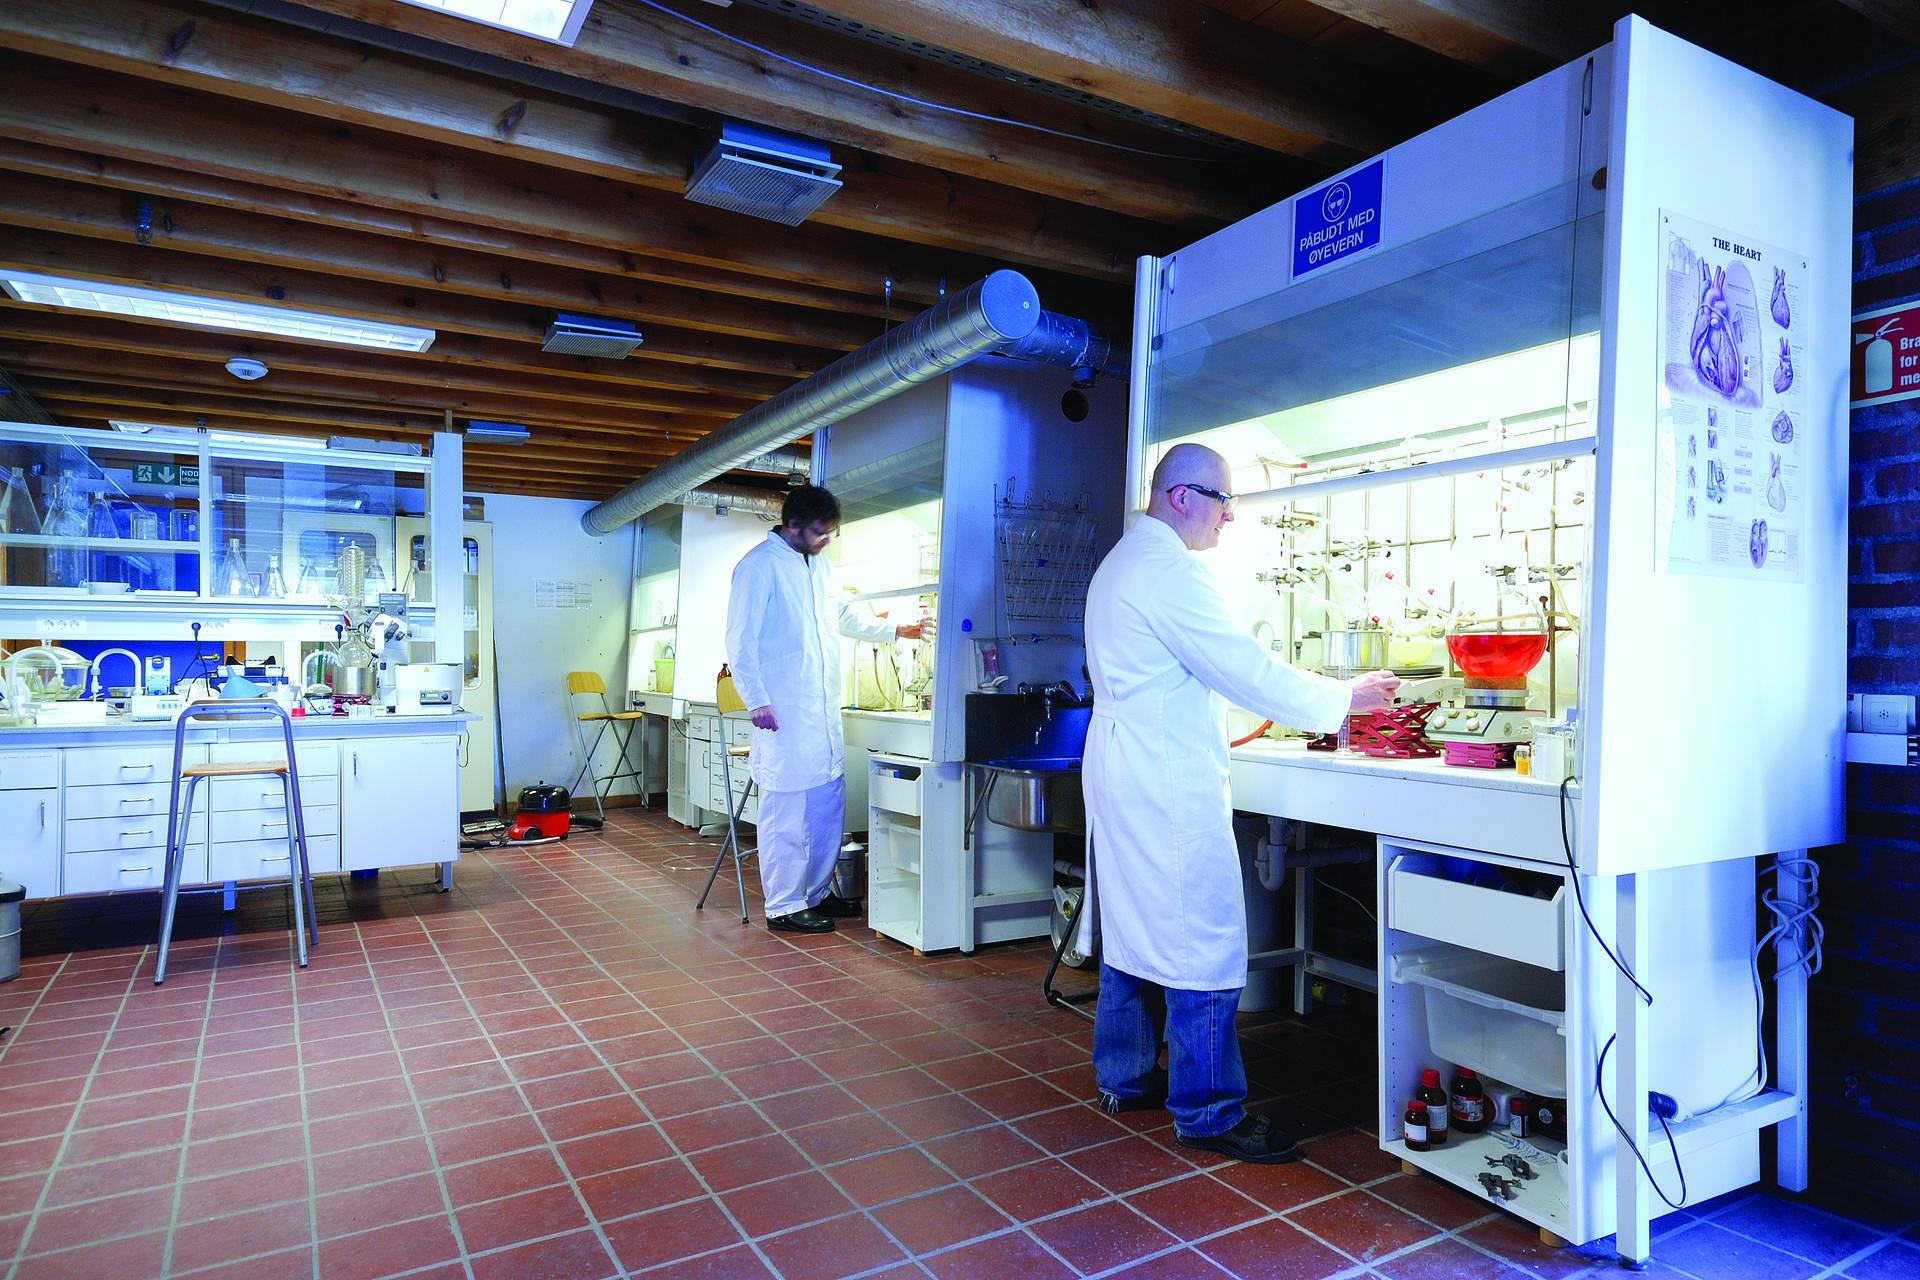 Biosynth lab